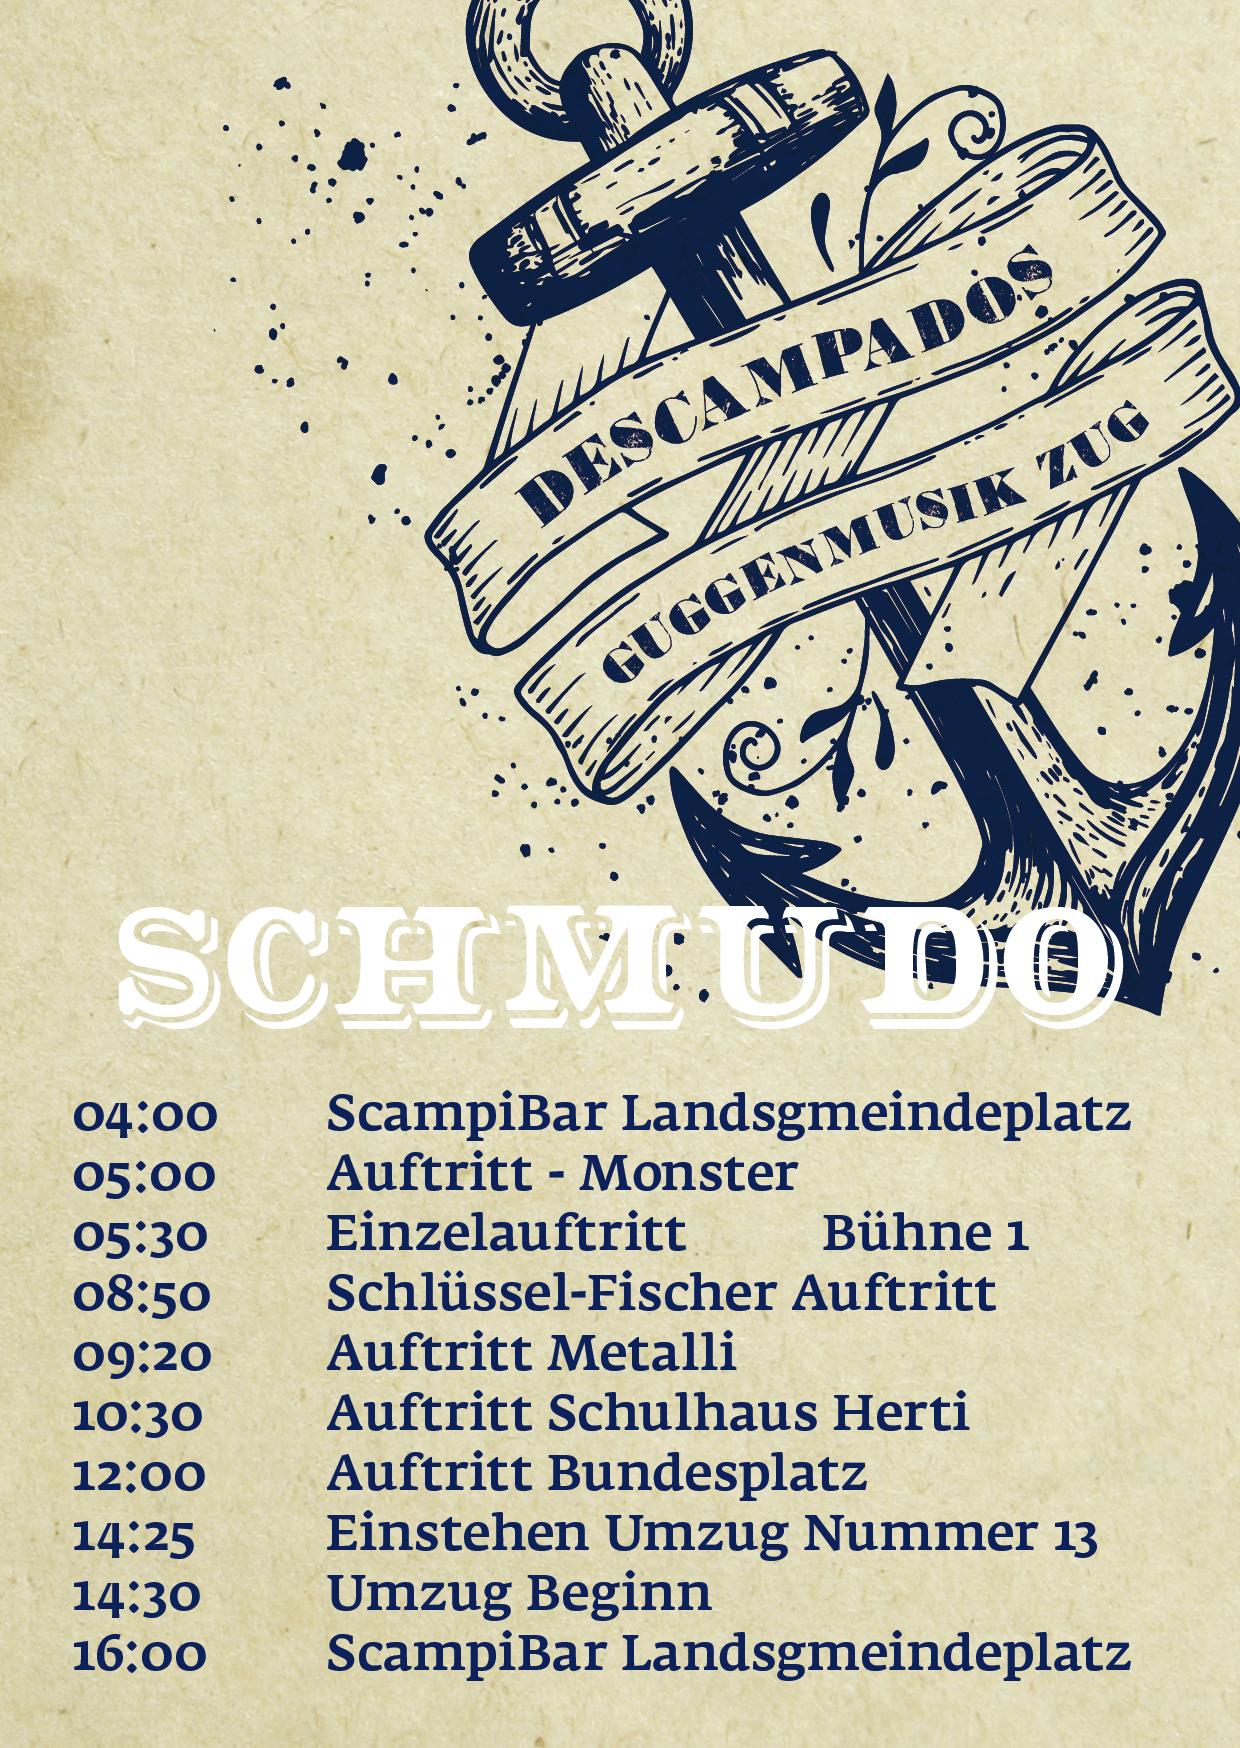 scampis_programm_schmudo